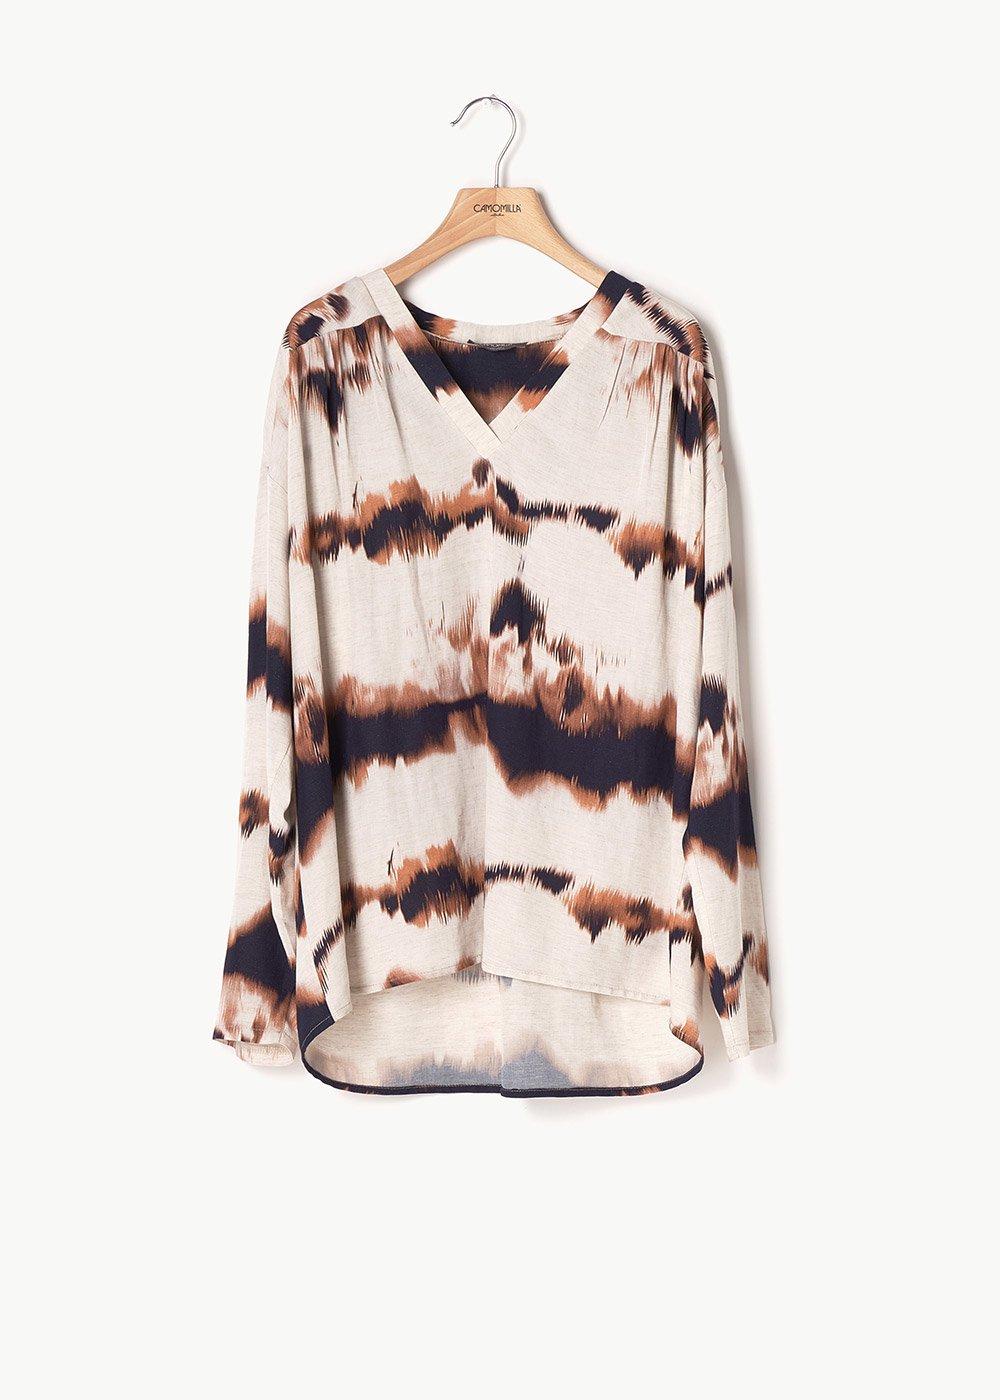 Shannon coordinated T-shirt - L.beige\ Coccio Fantasia - Woman